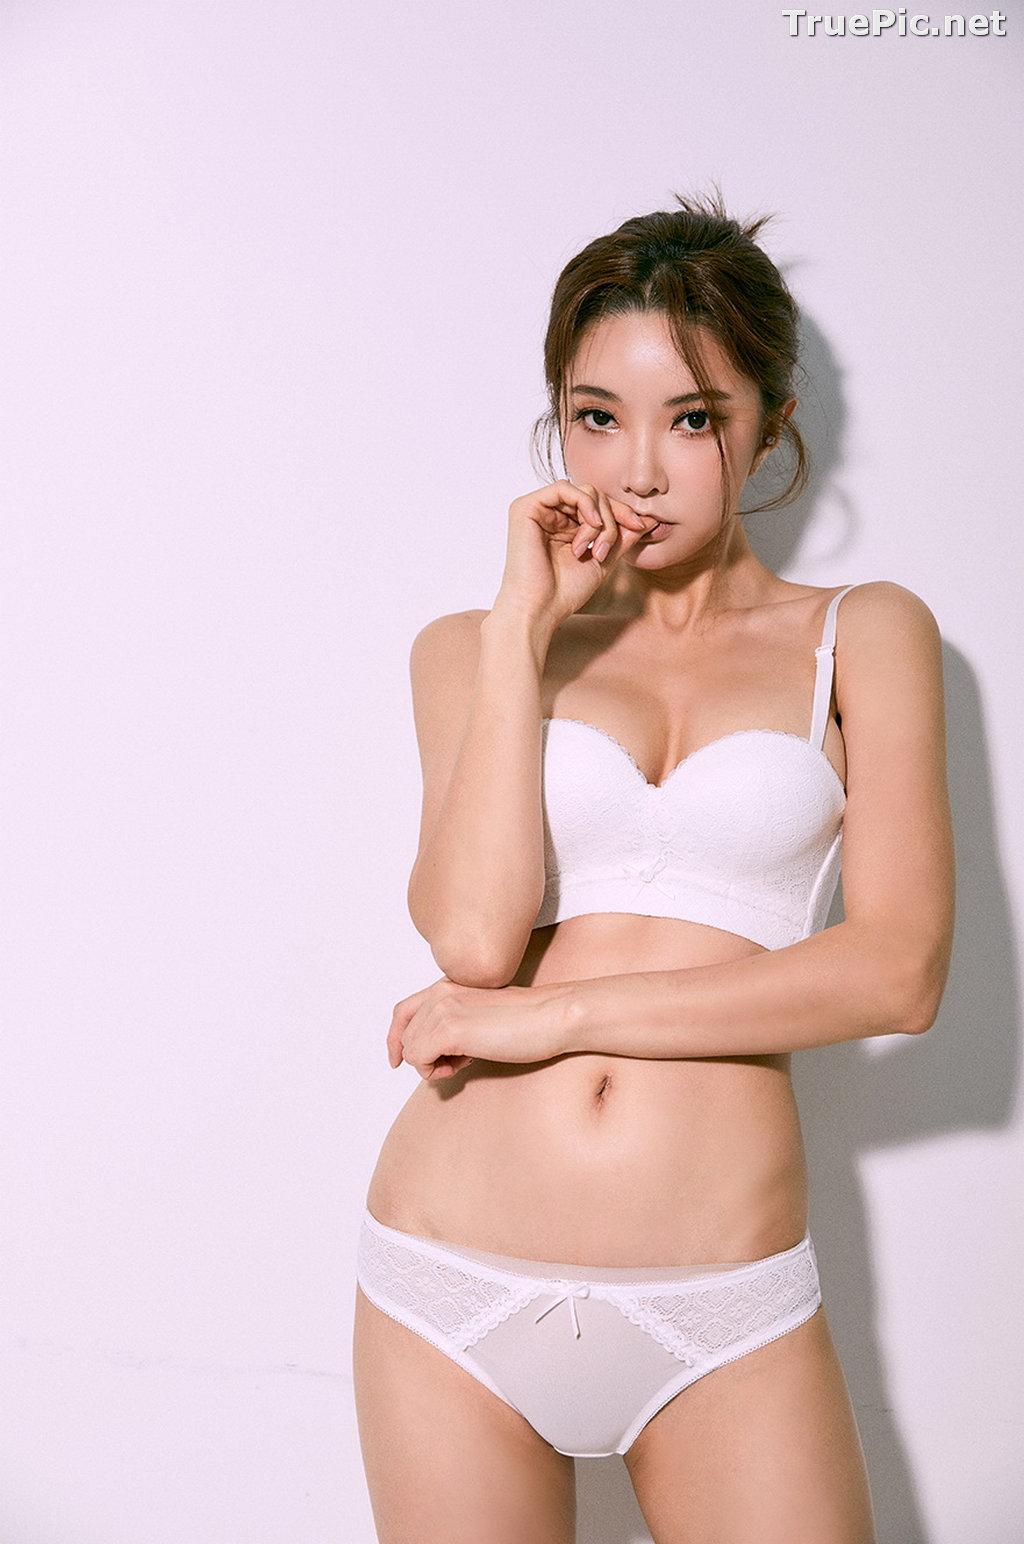 Image Korean Fashion Model - Park Soo Yeon - Open Up Lingerie - TruePic.net - Picture-6